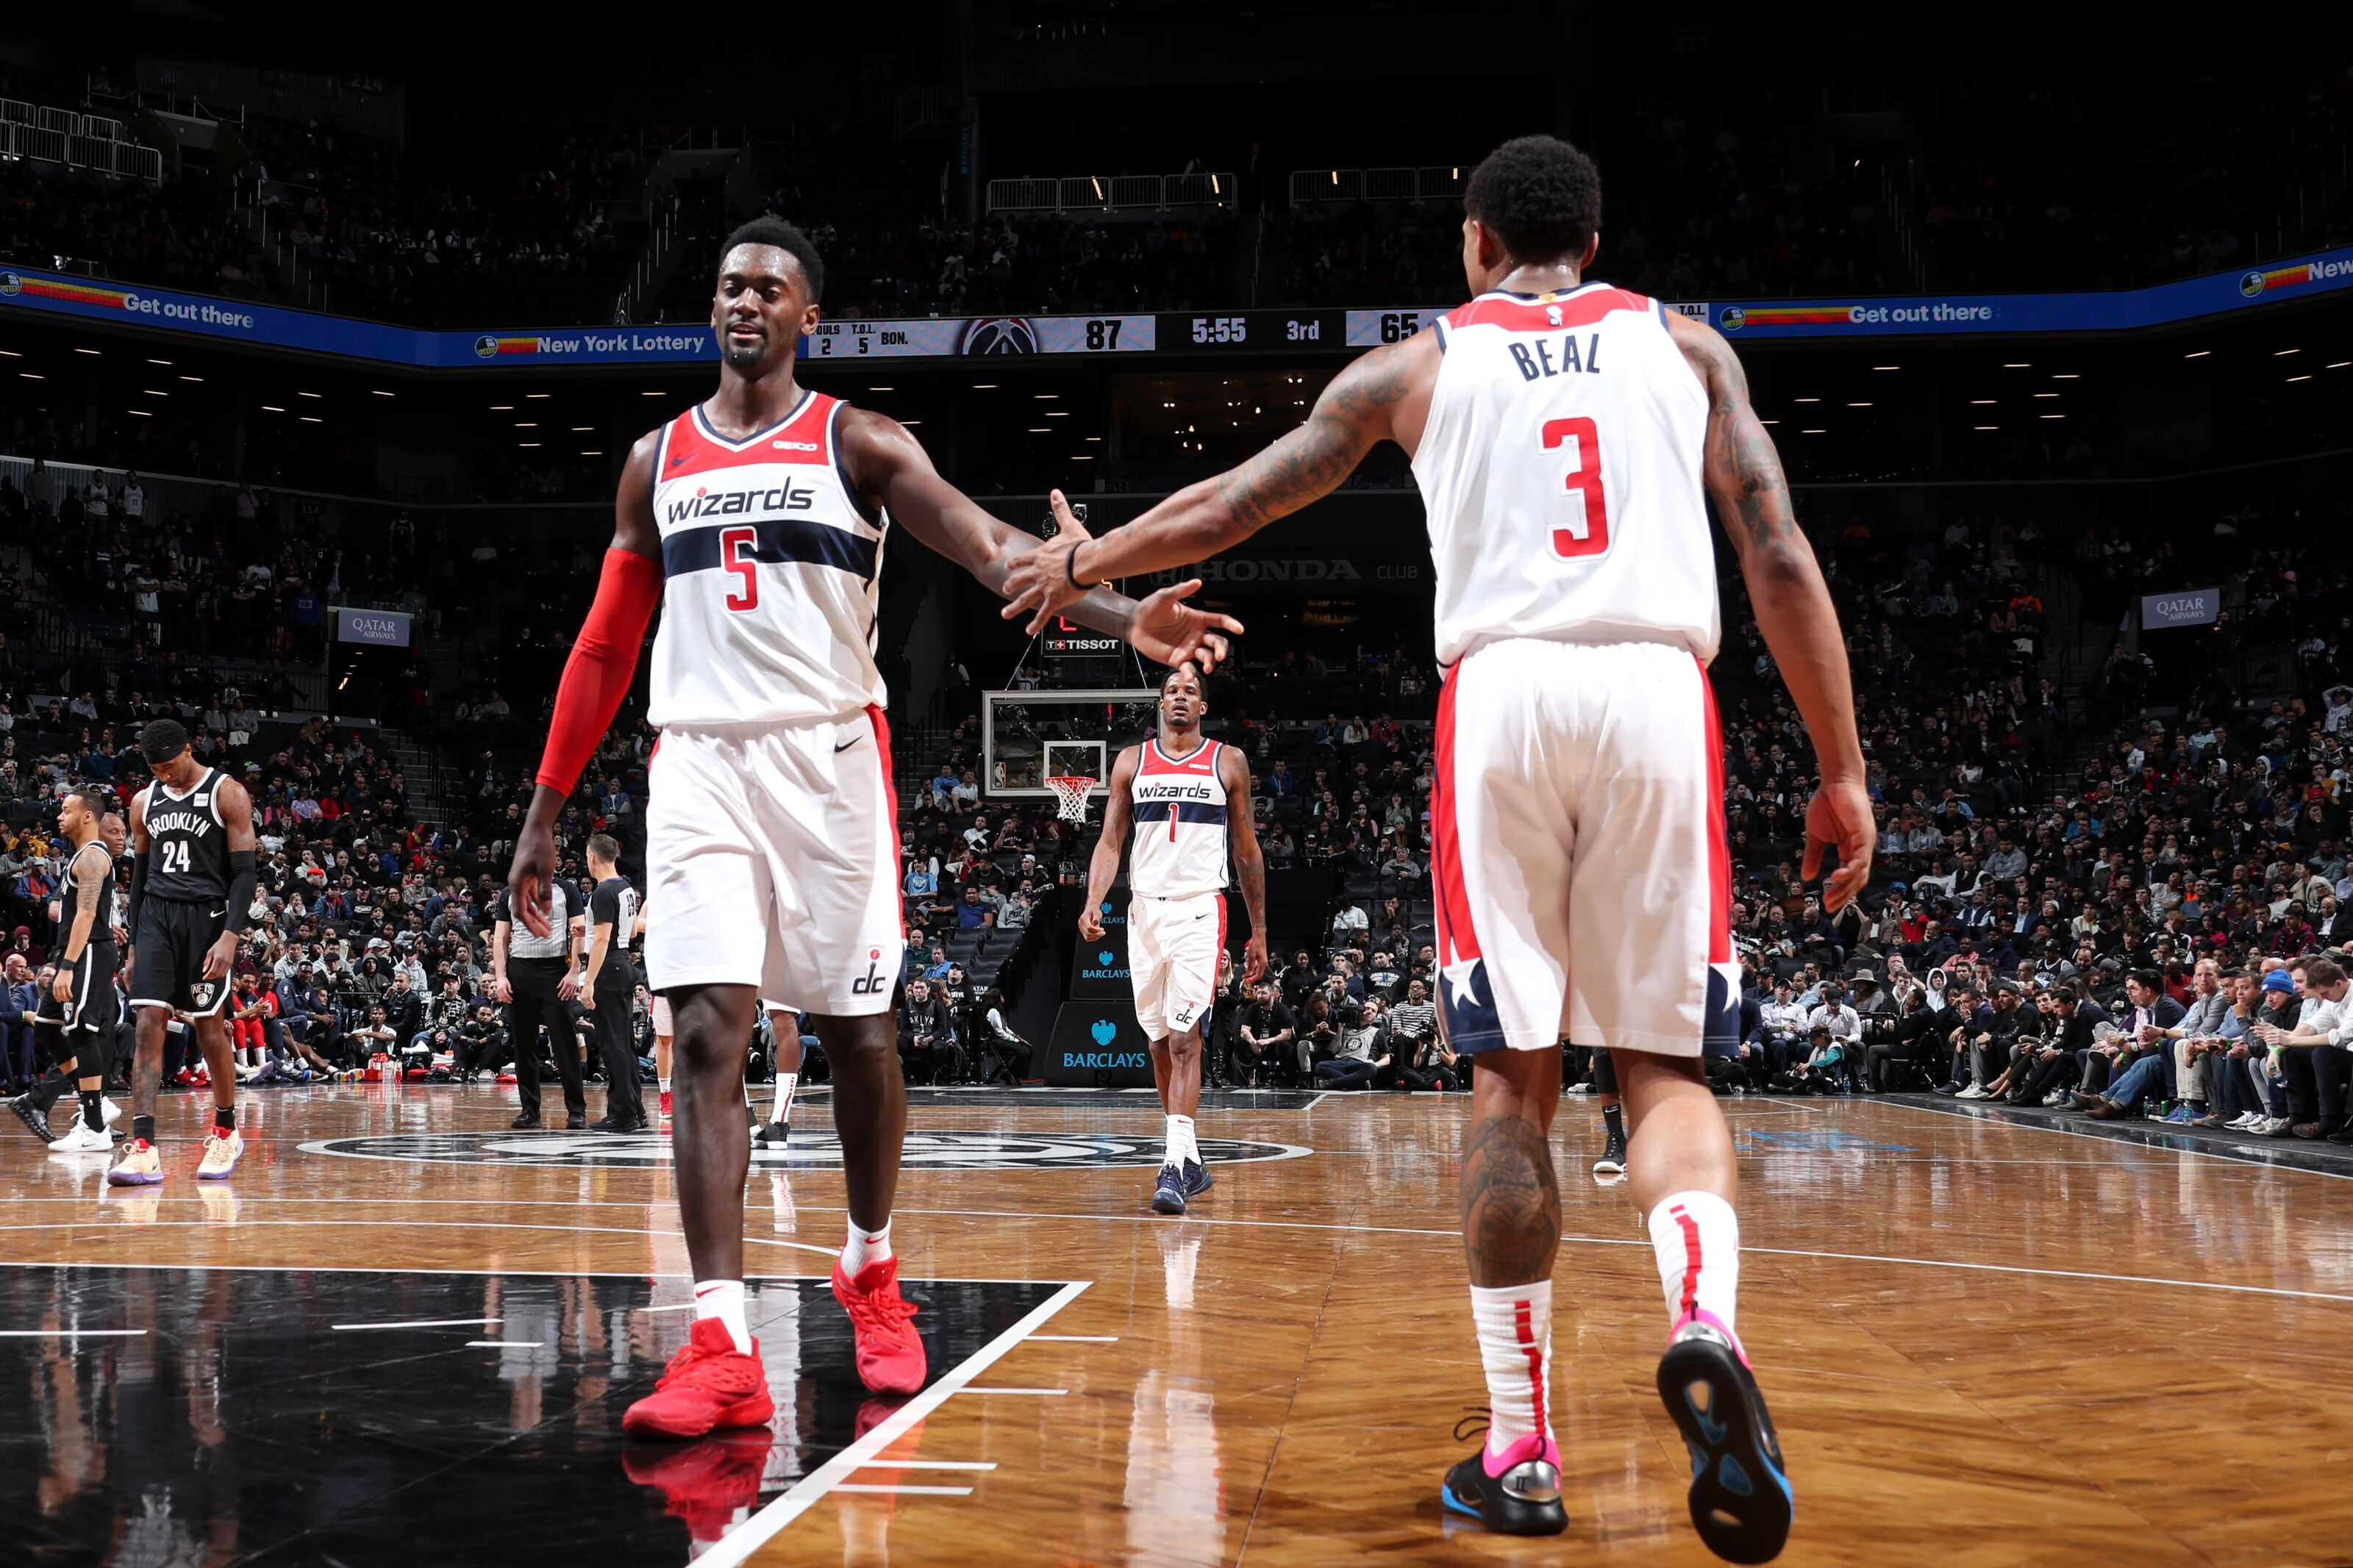 Team Effort Nets Washington Wizards Rare Road Win - National ... 563cceca4